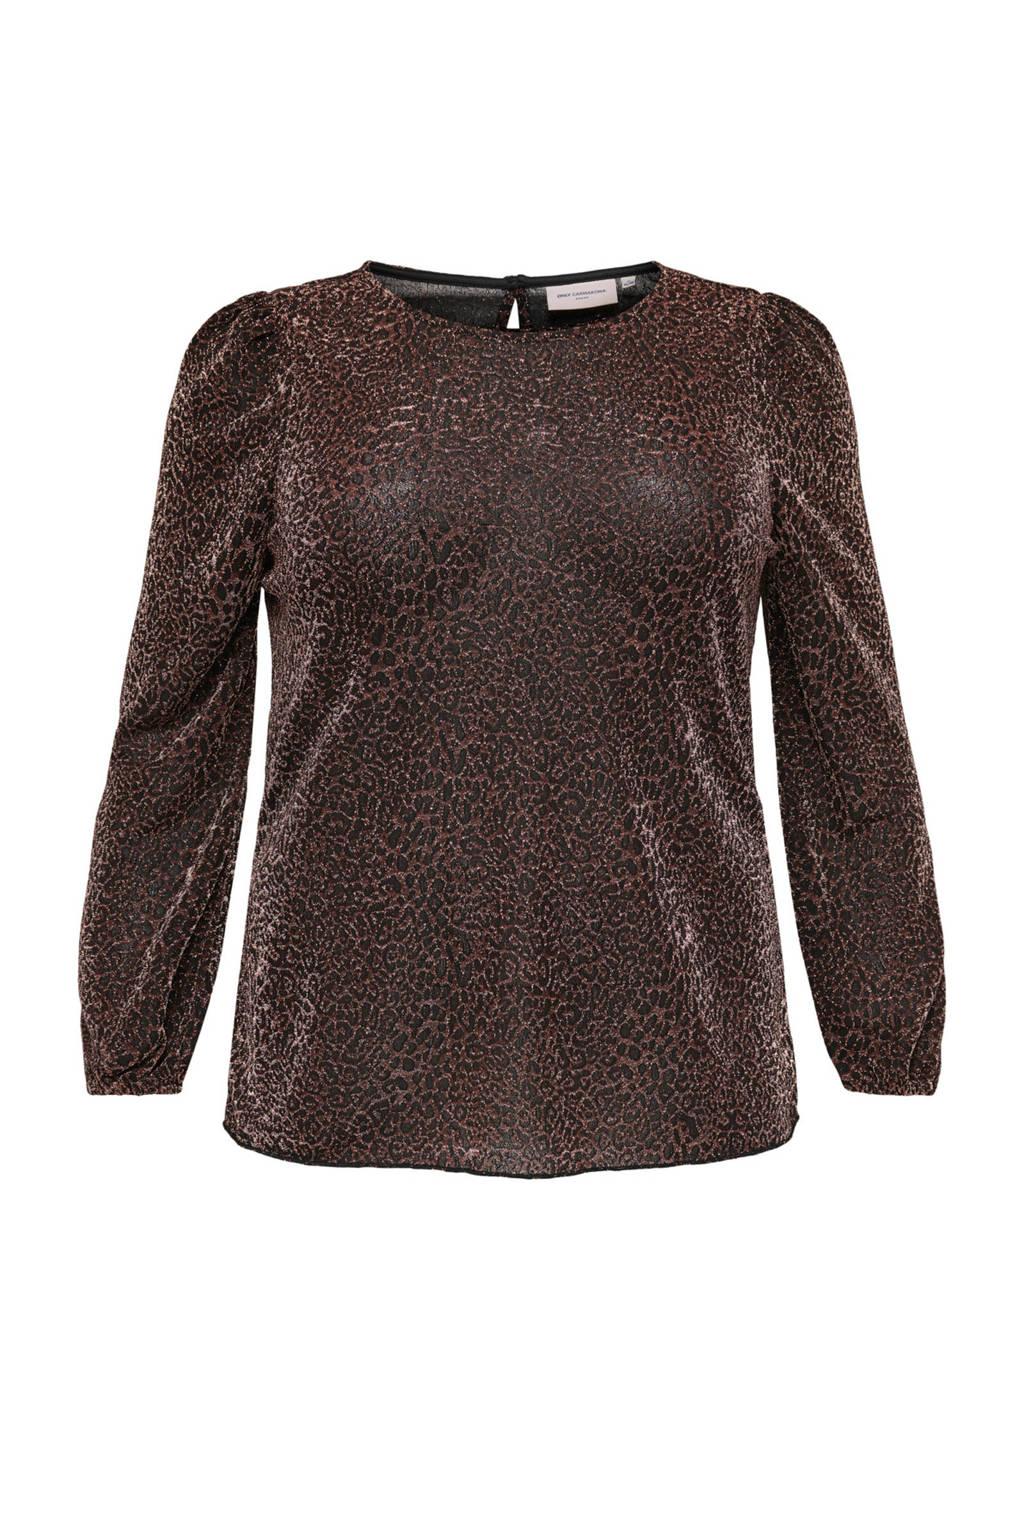 ONLY CARMAKOMA blouse zwart, Zwart